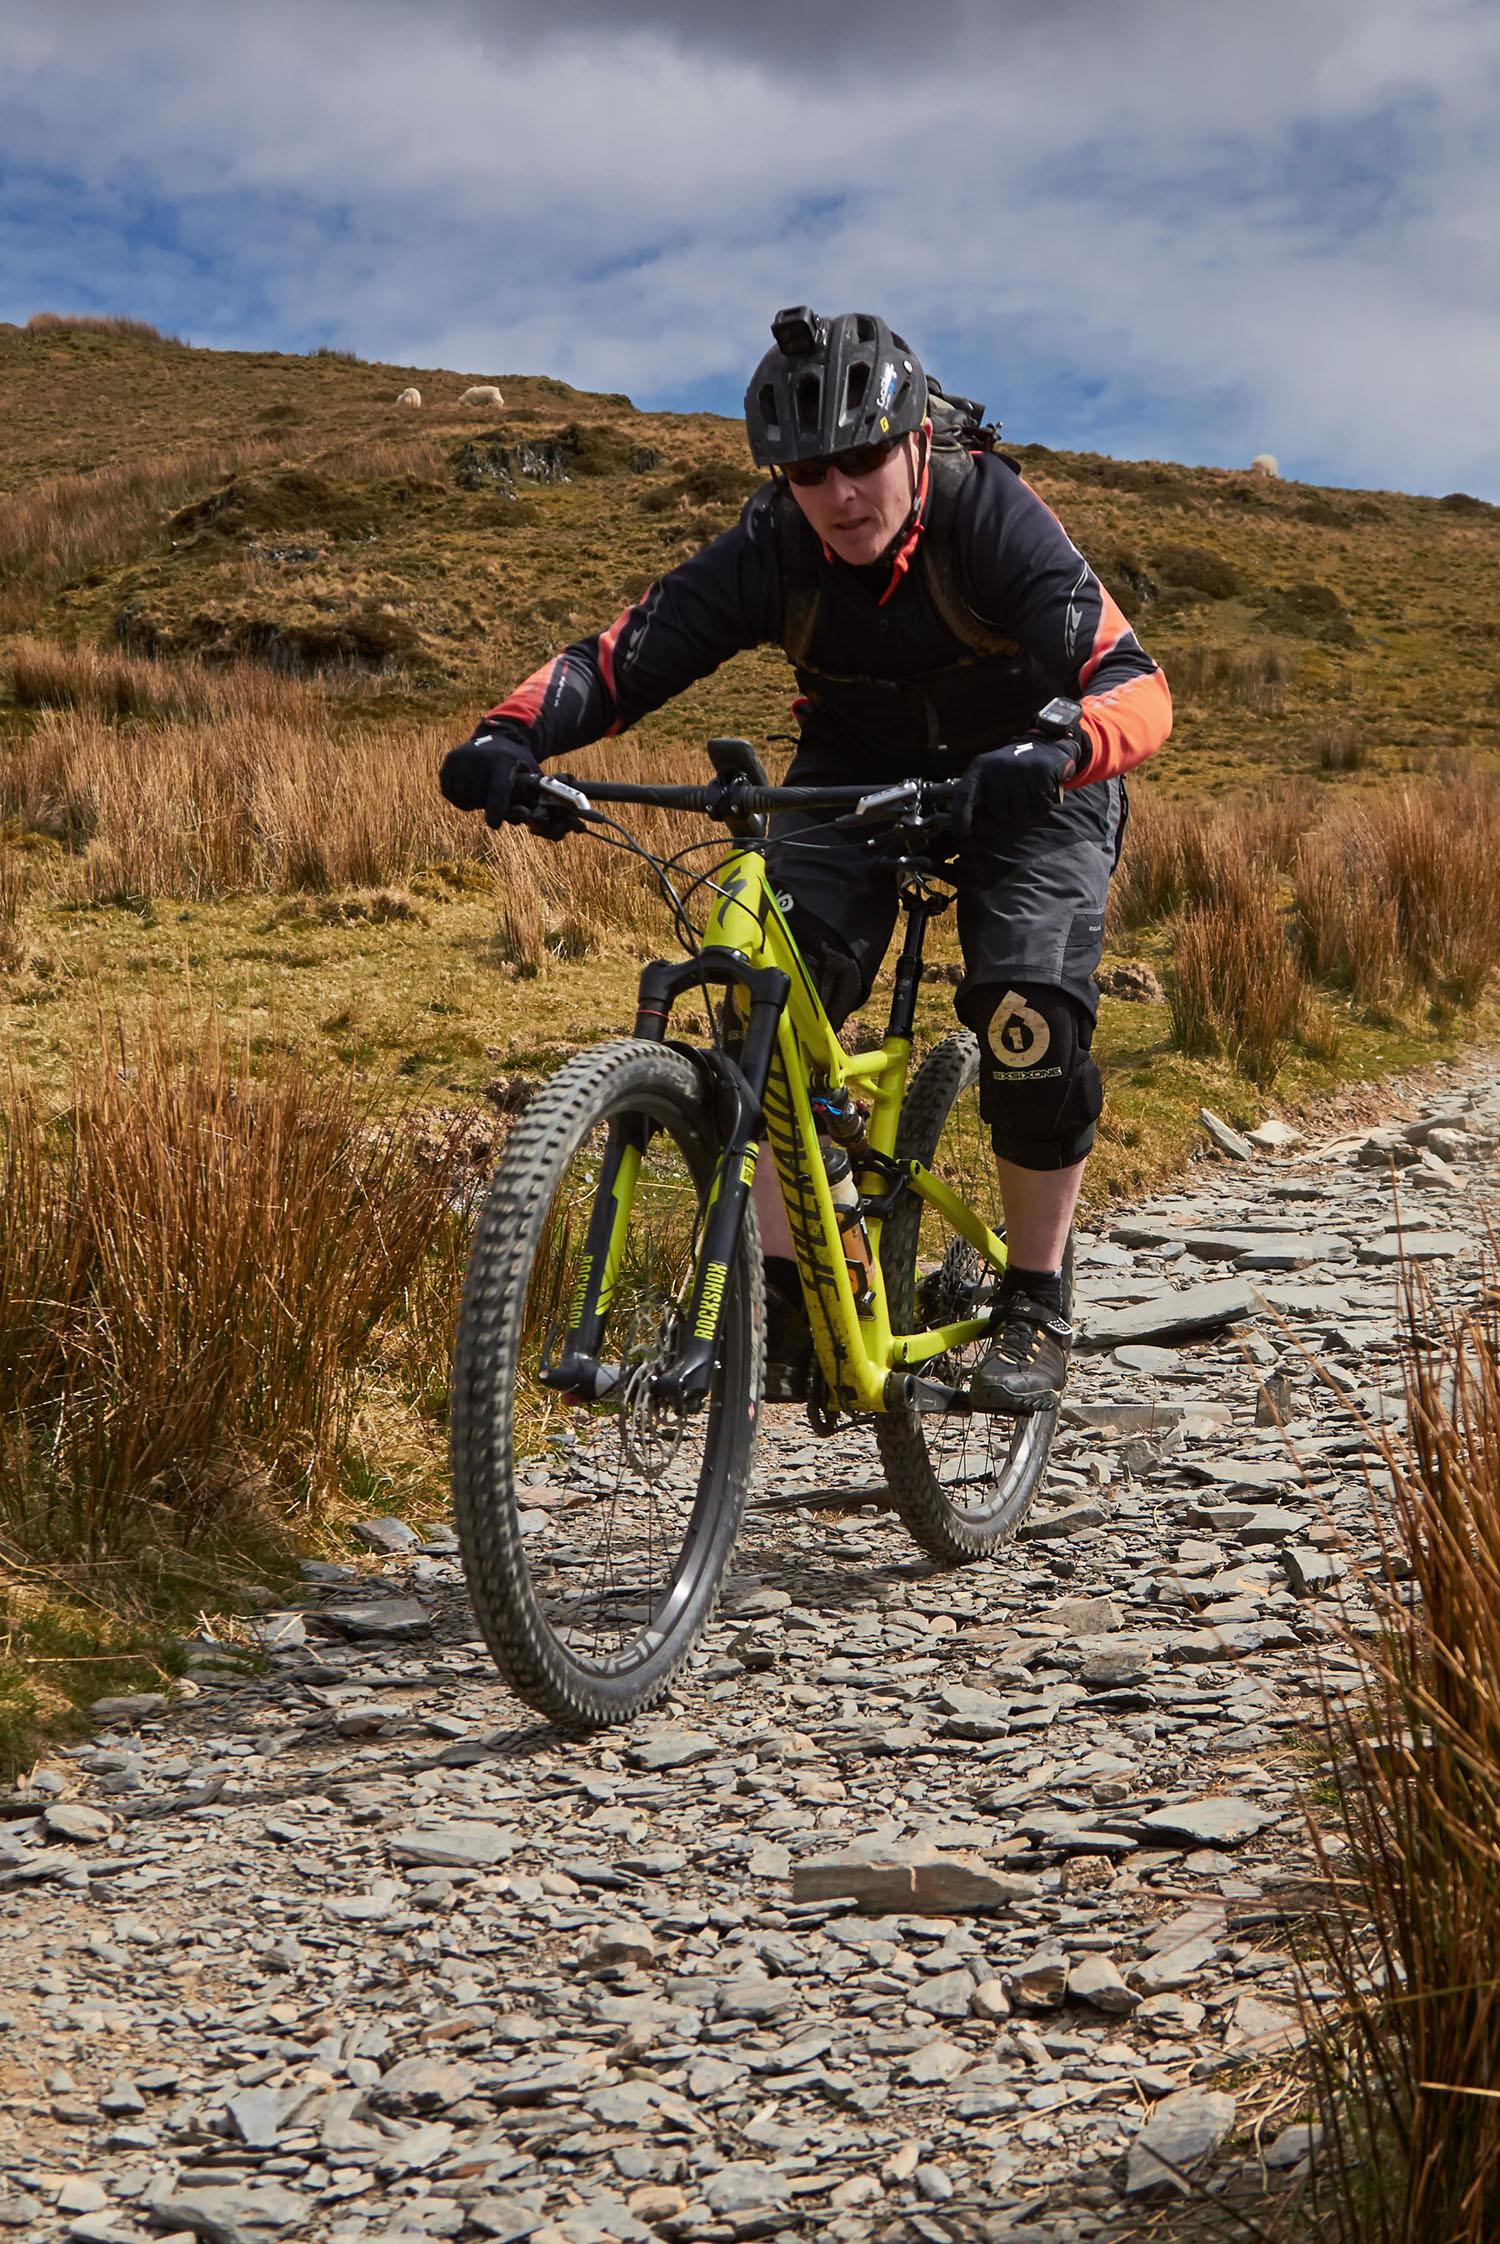 Snowdon_Mt_Bike_Descent_3_Web.jpg